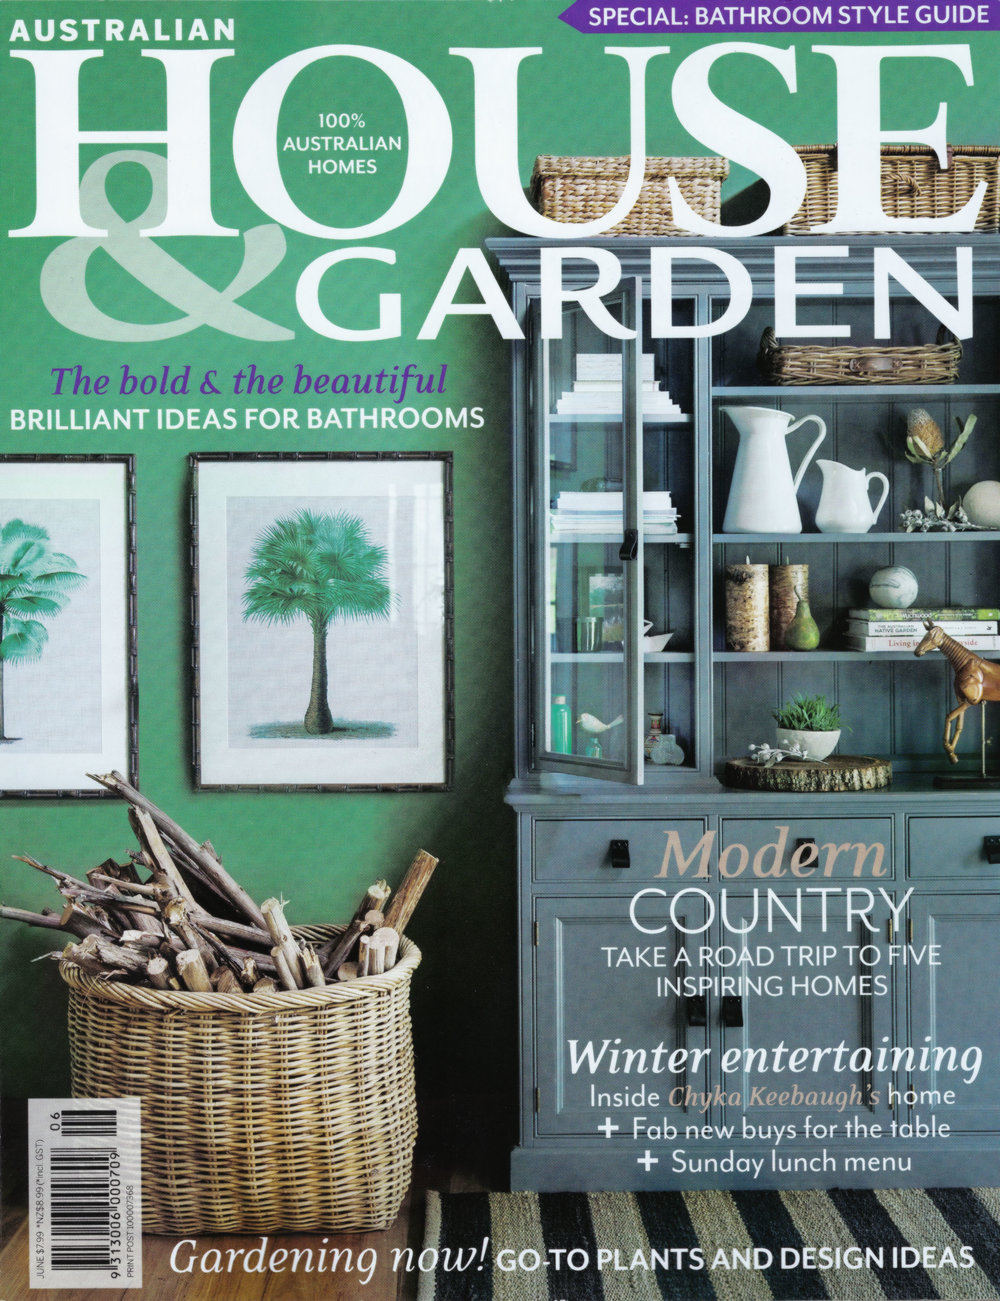 House-and-Garden-June-2017-cover.jpg